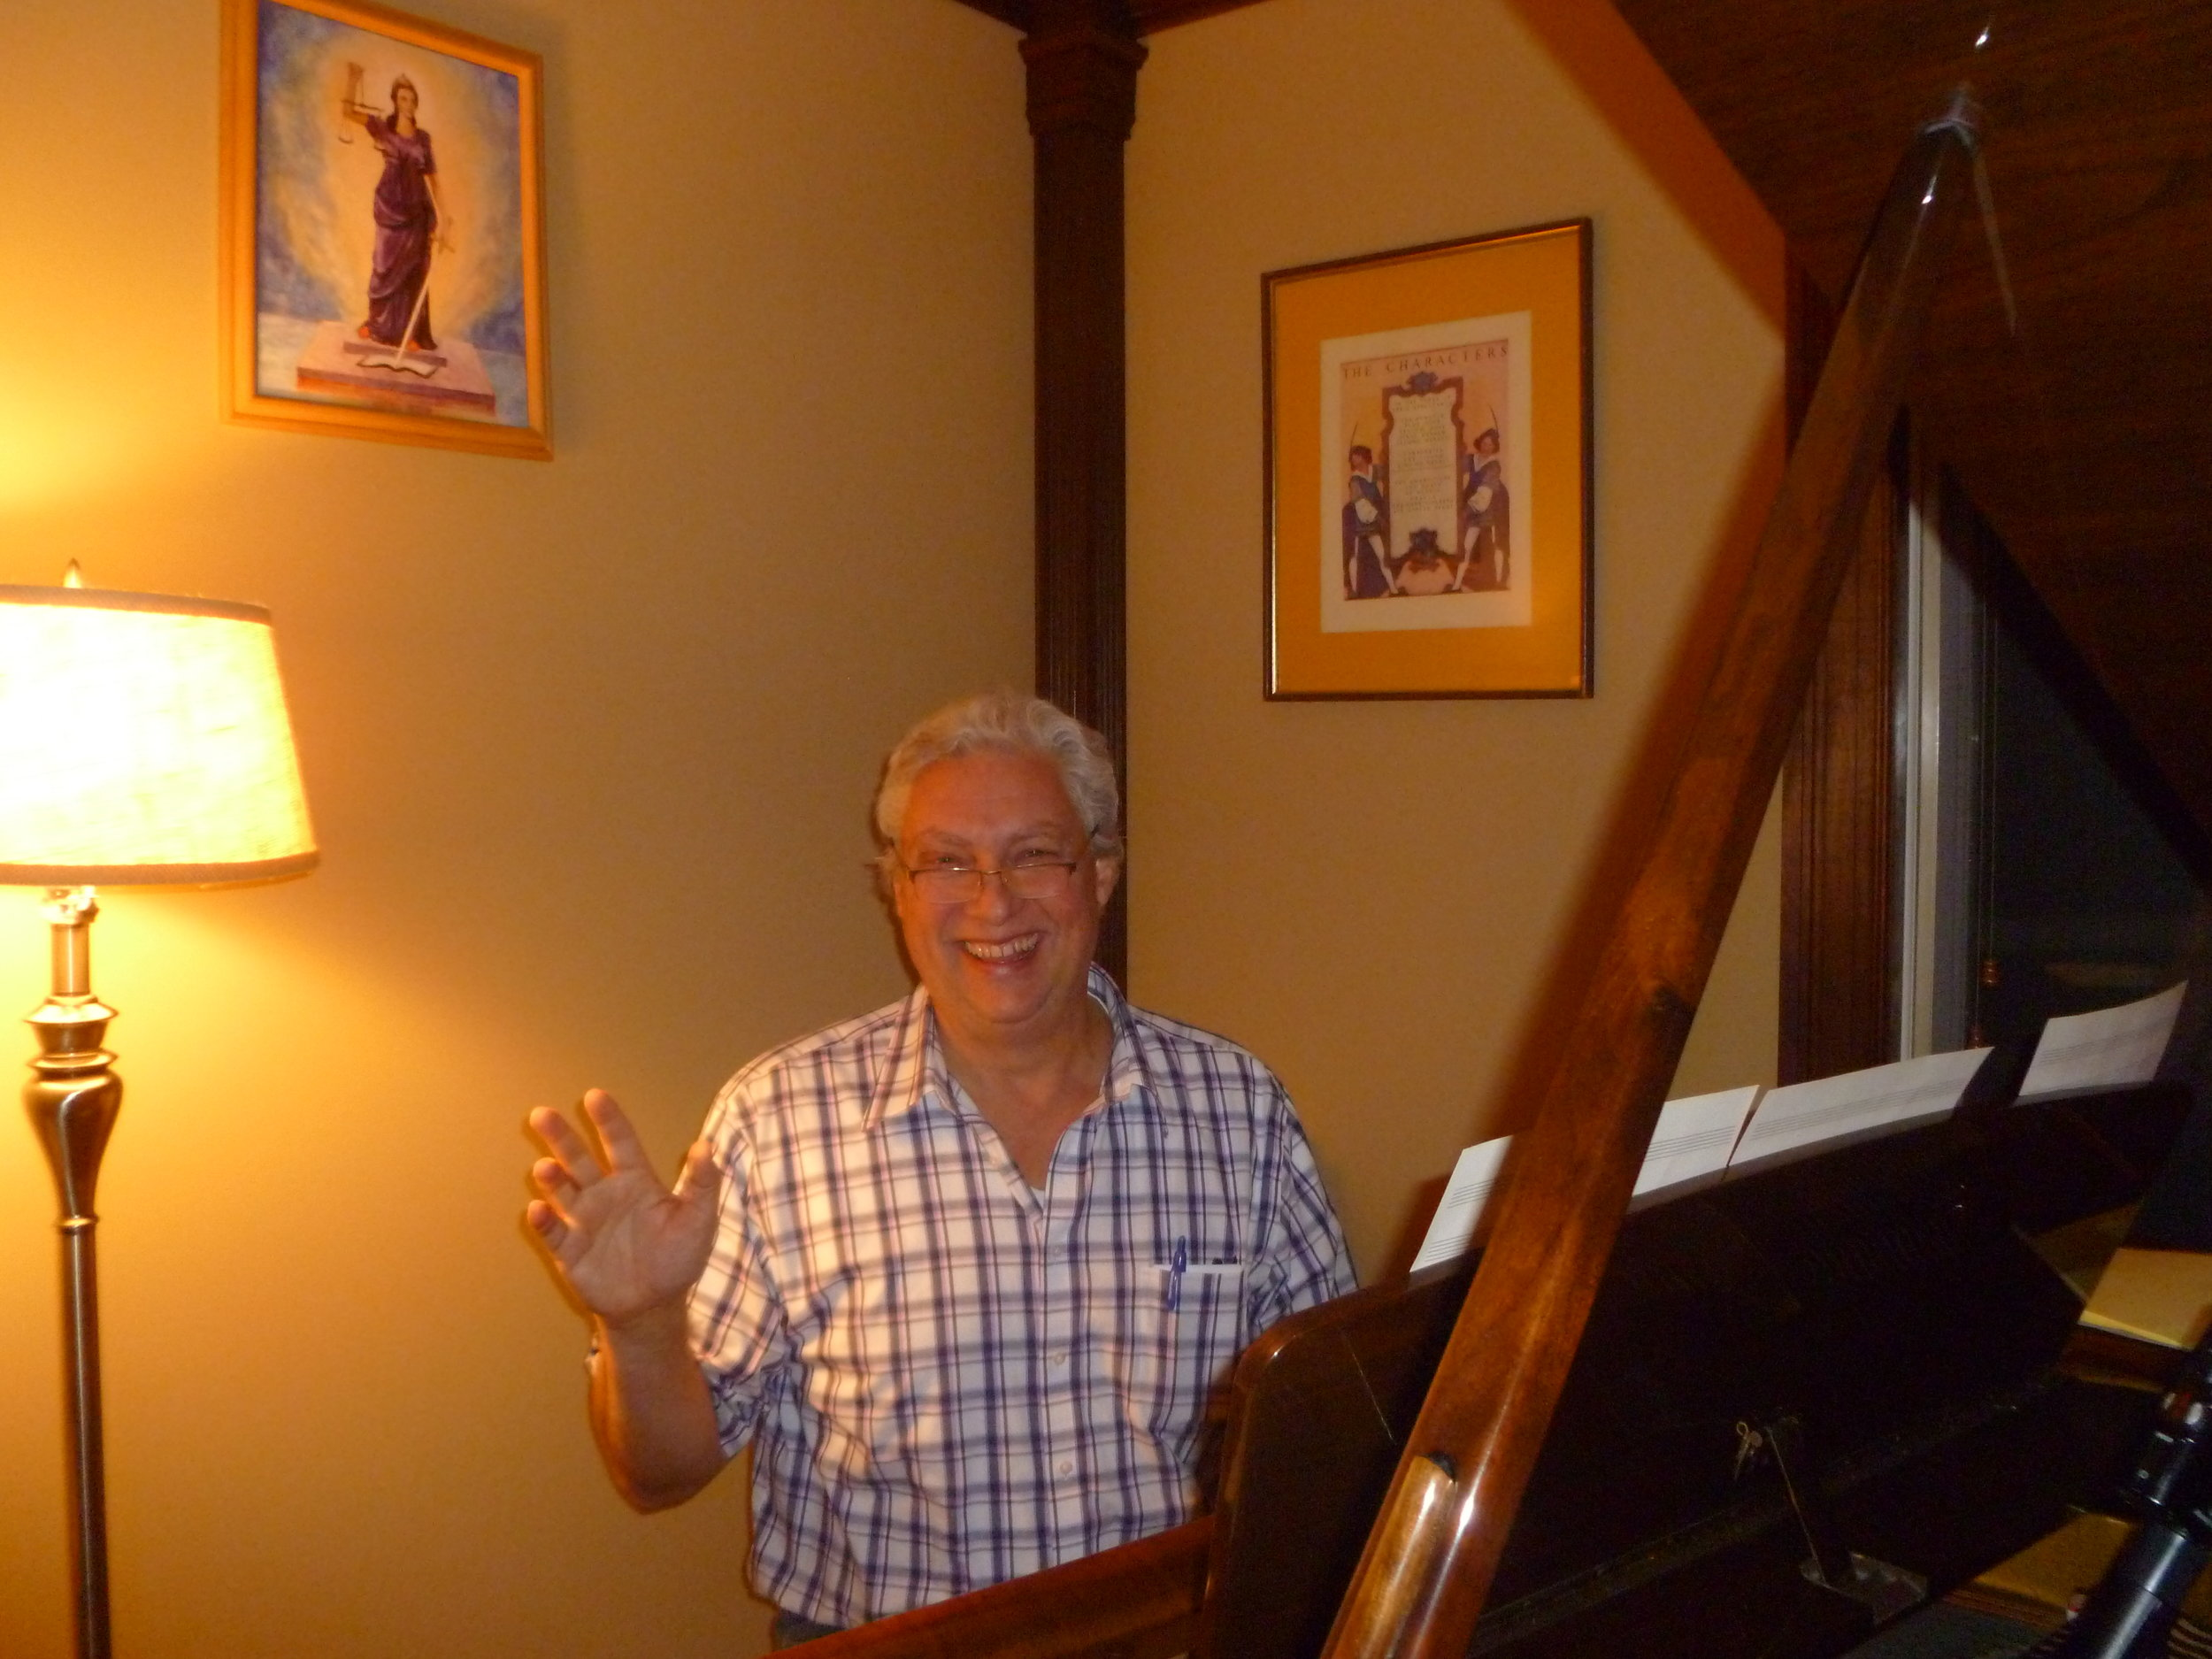 David finds playing the piano balancing, strengthening, and an inspiring activity.